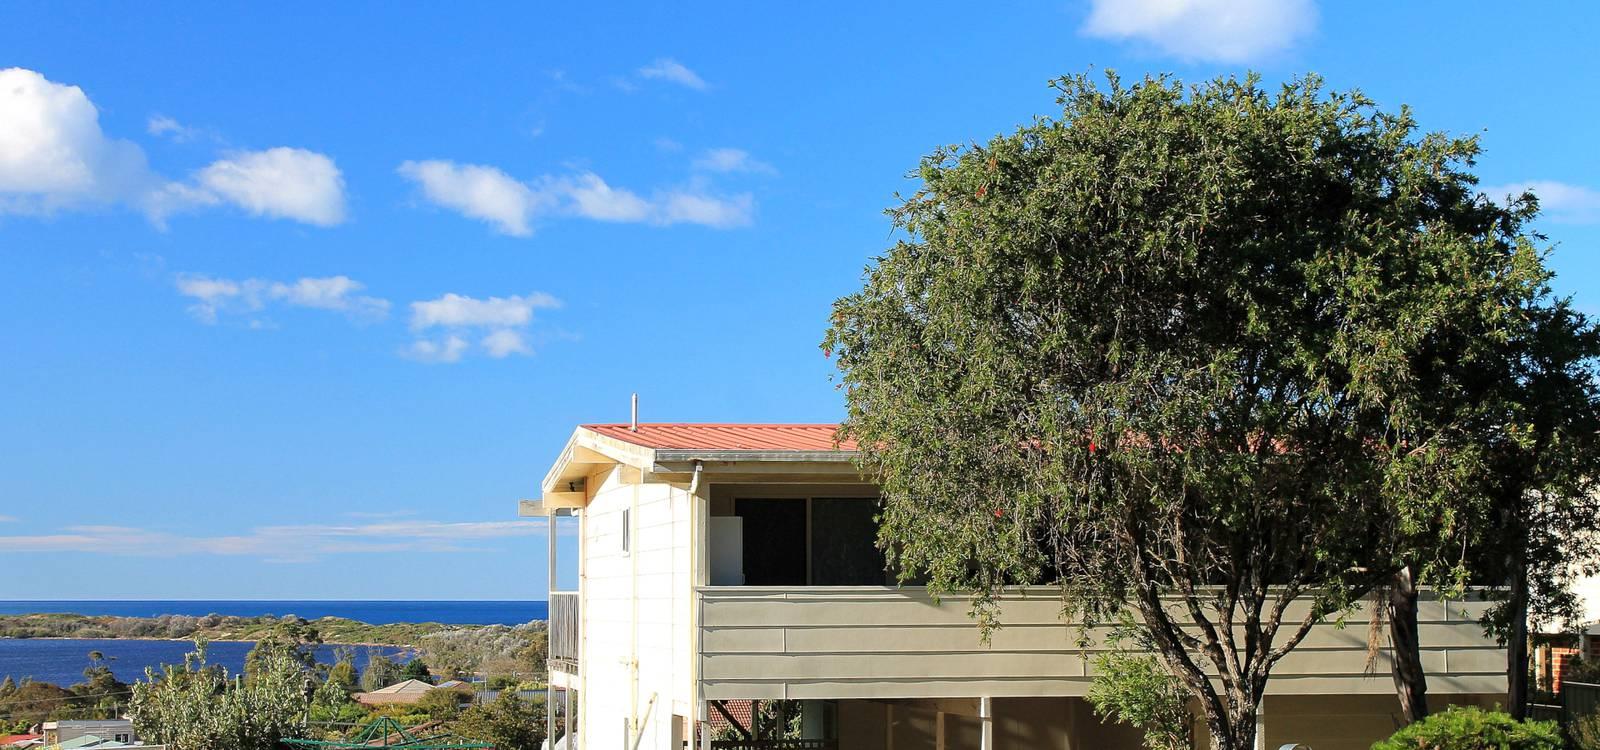 130 Hector McWilliam Drive TUROSS HEAD, NSW 2537 - photo 1